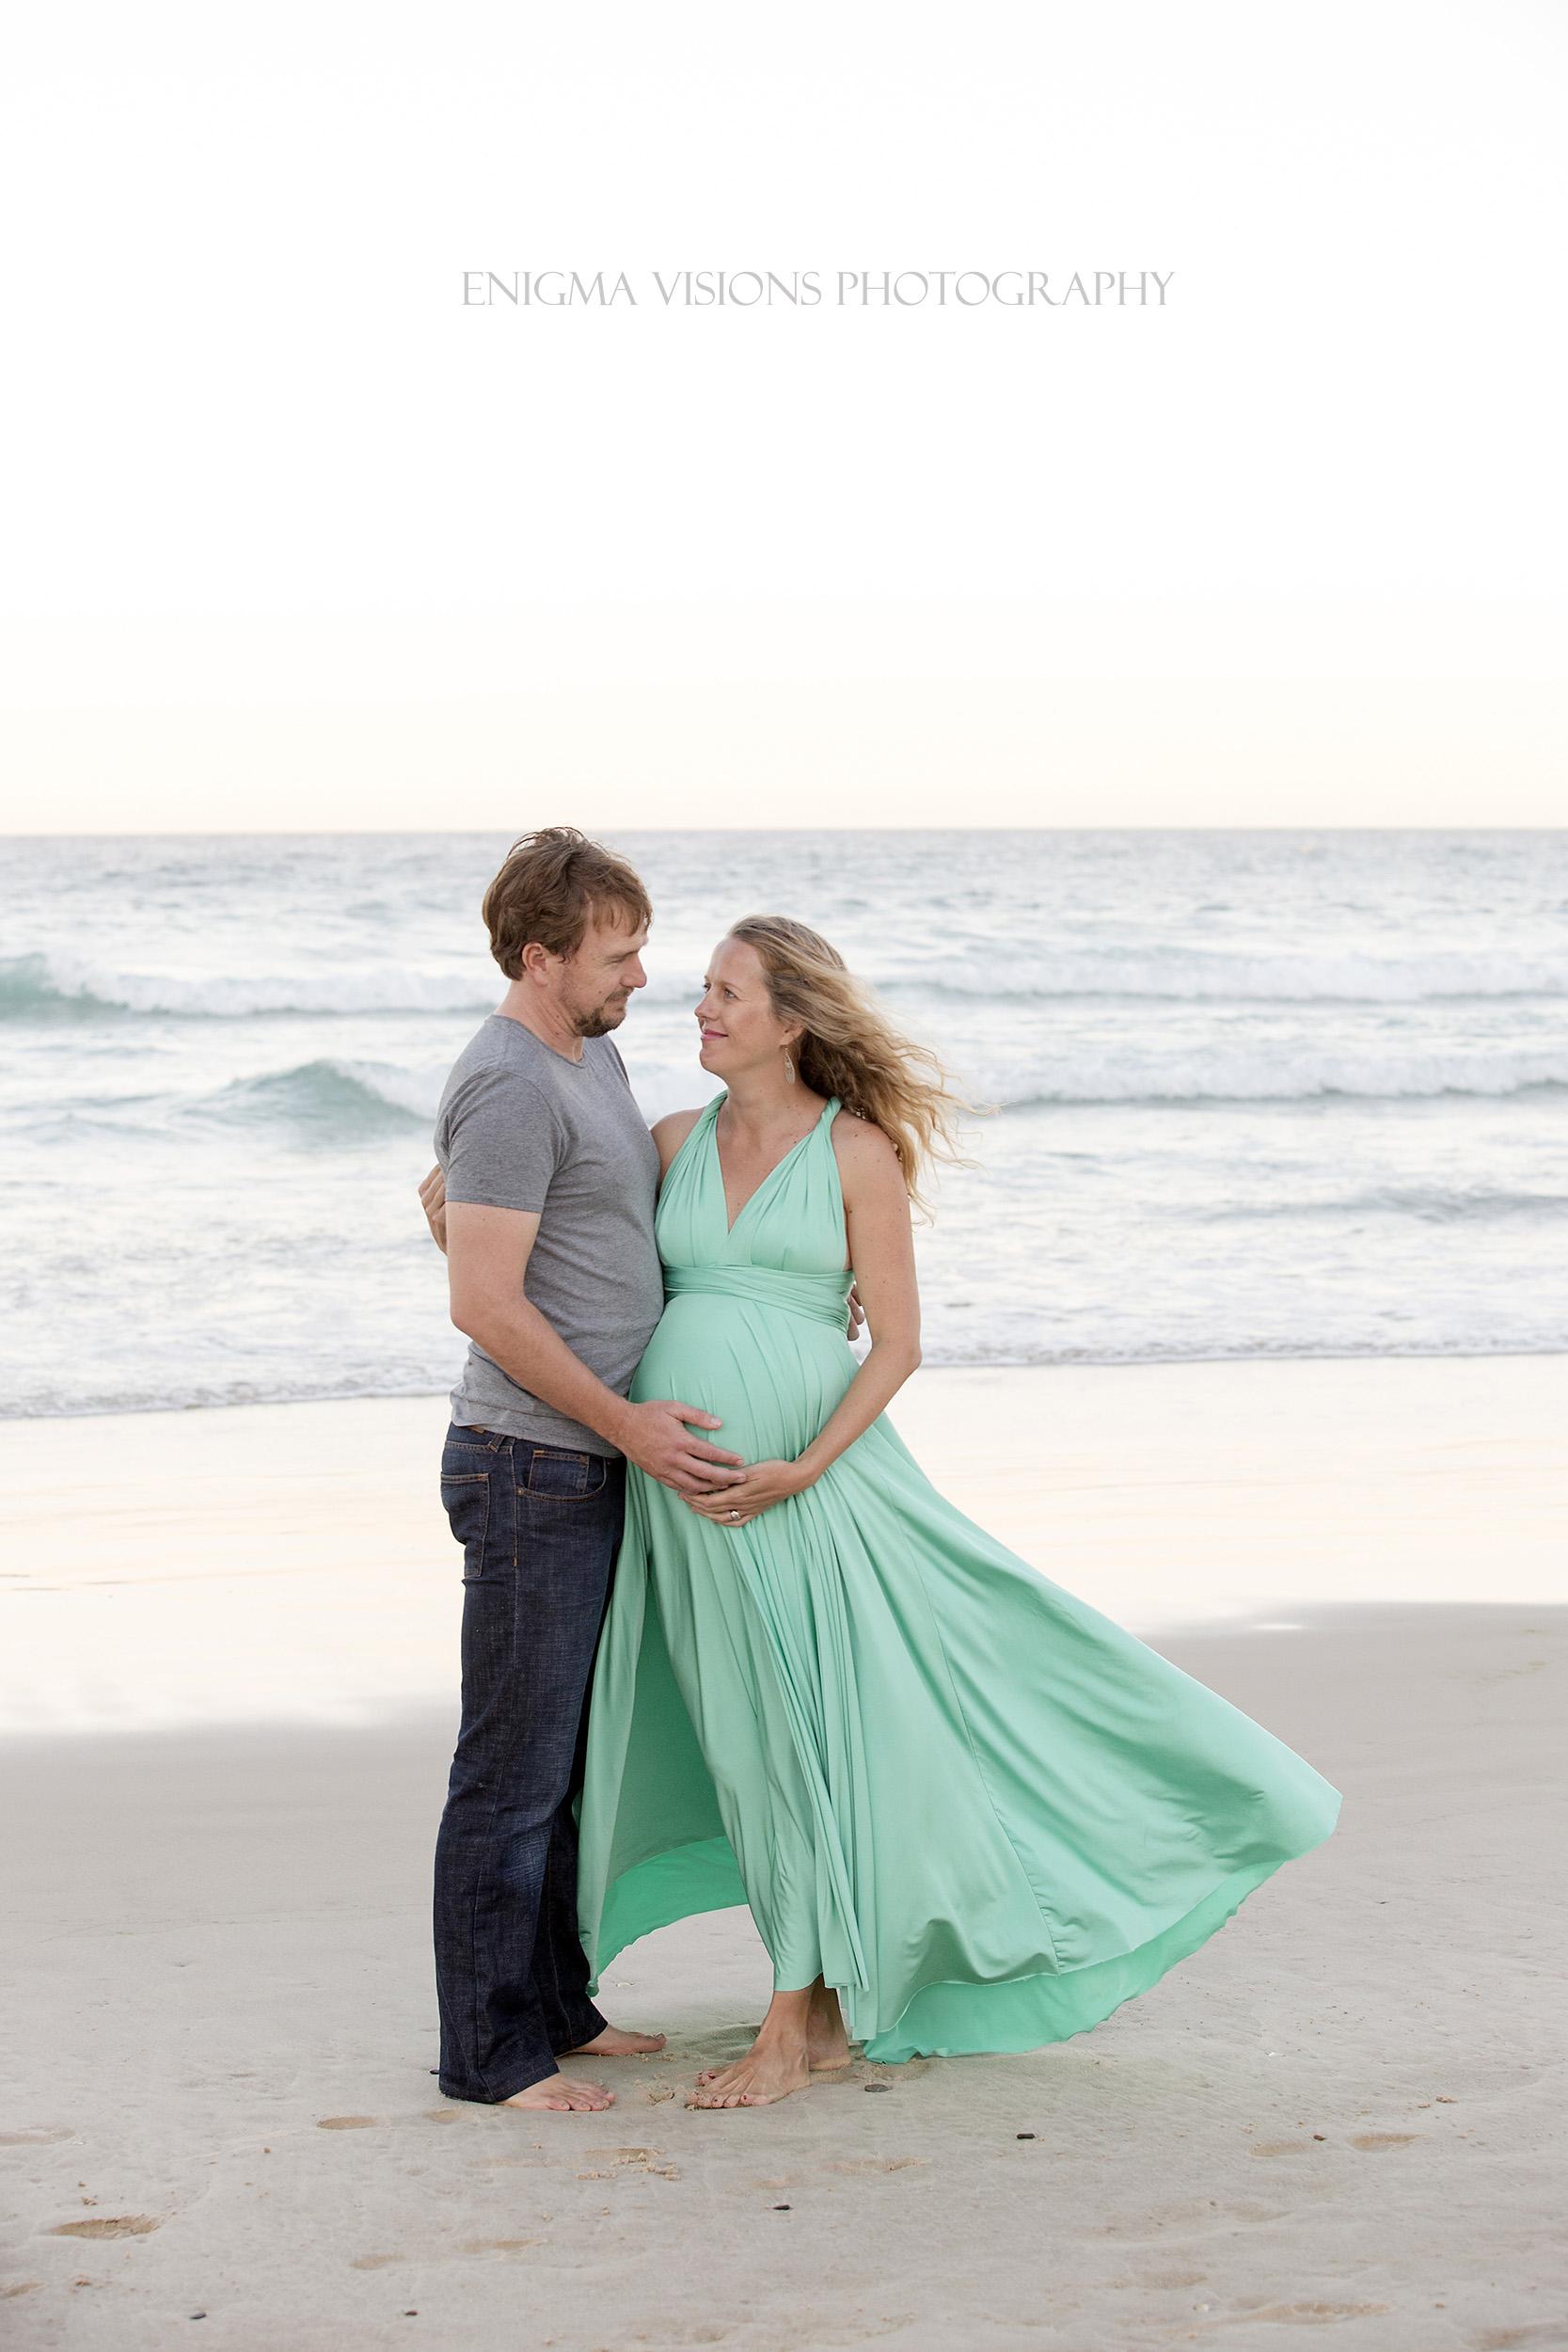 enigma_visions_photography_maternity_melandandrew_kingscliff (42).jpg